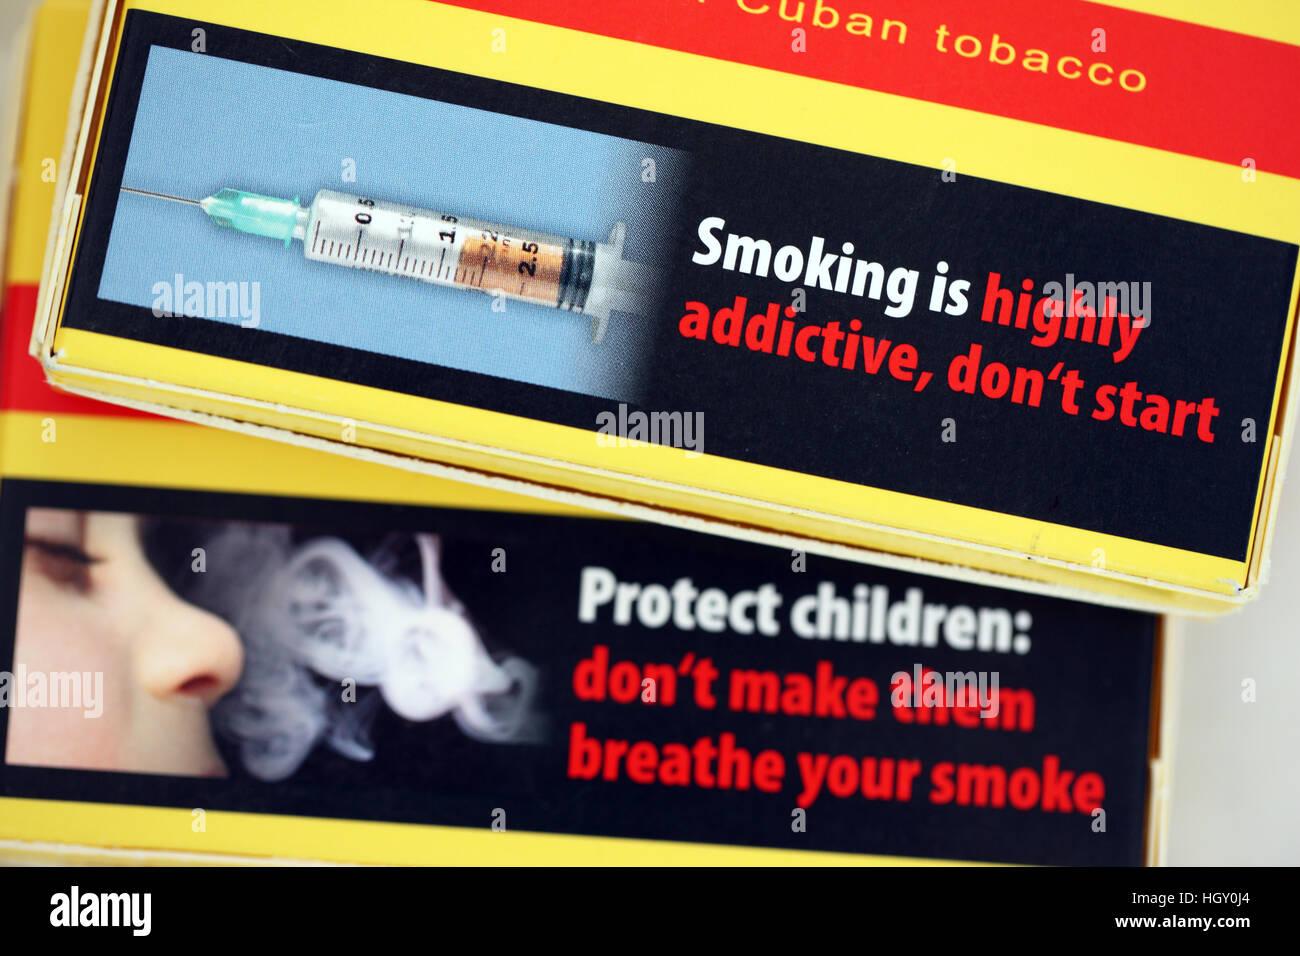 Smoking health warnings on cigar packets - Stock Image